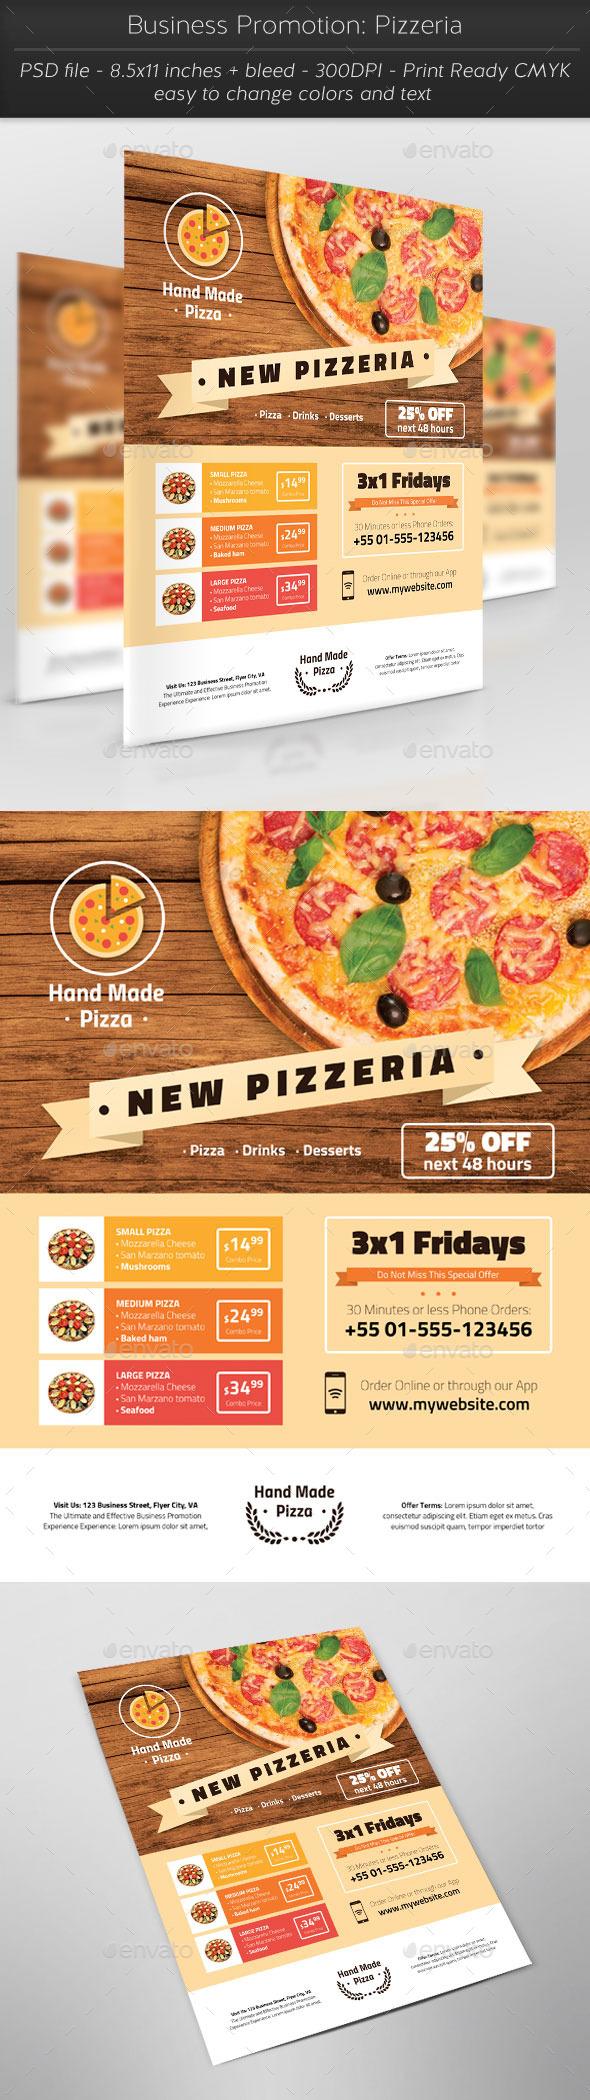 GraphicRiver Business Promotion Pizzeria 11372687